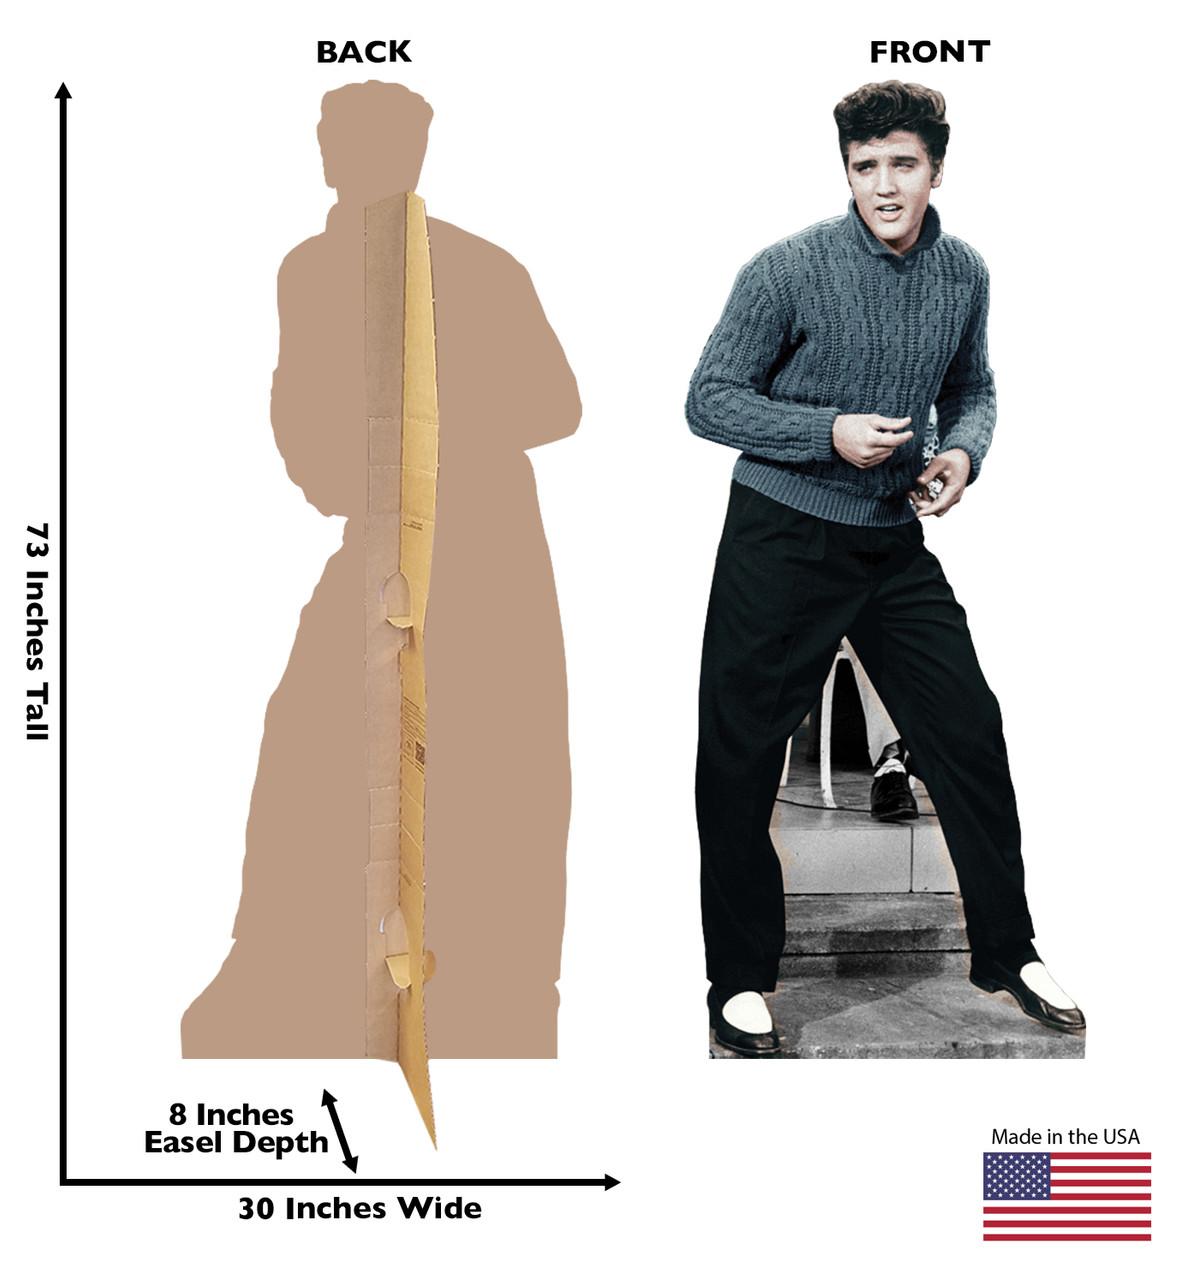 Elvis Blue Sweater Cardboard Cutout 844 dimensions